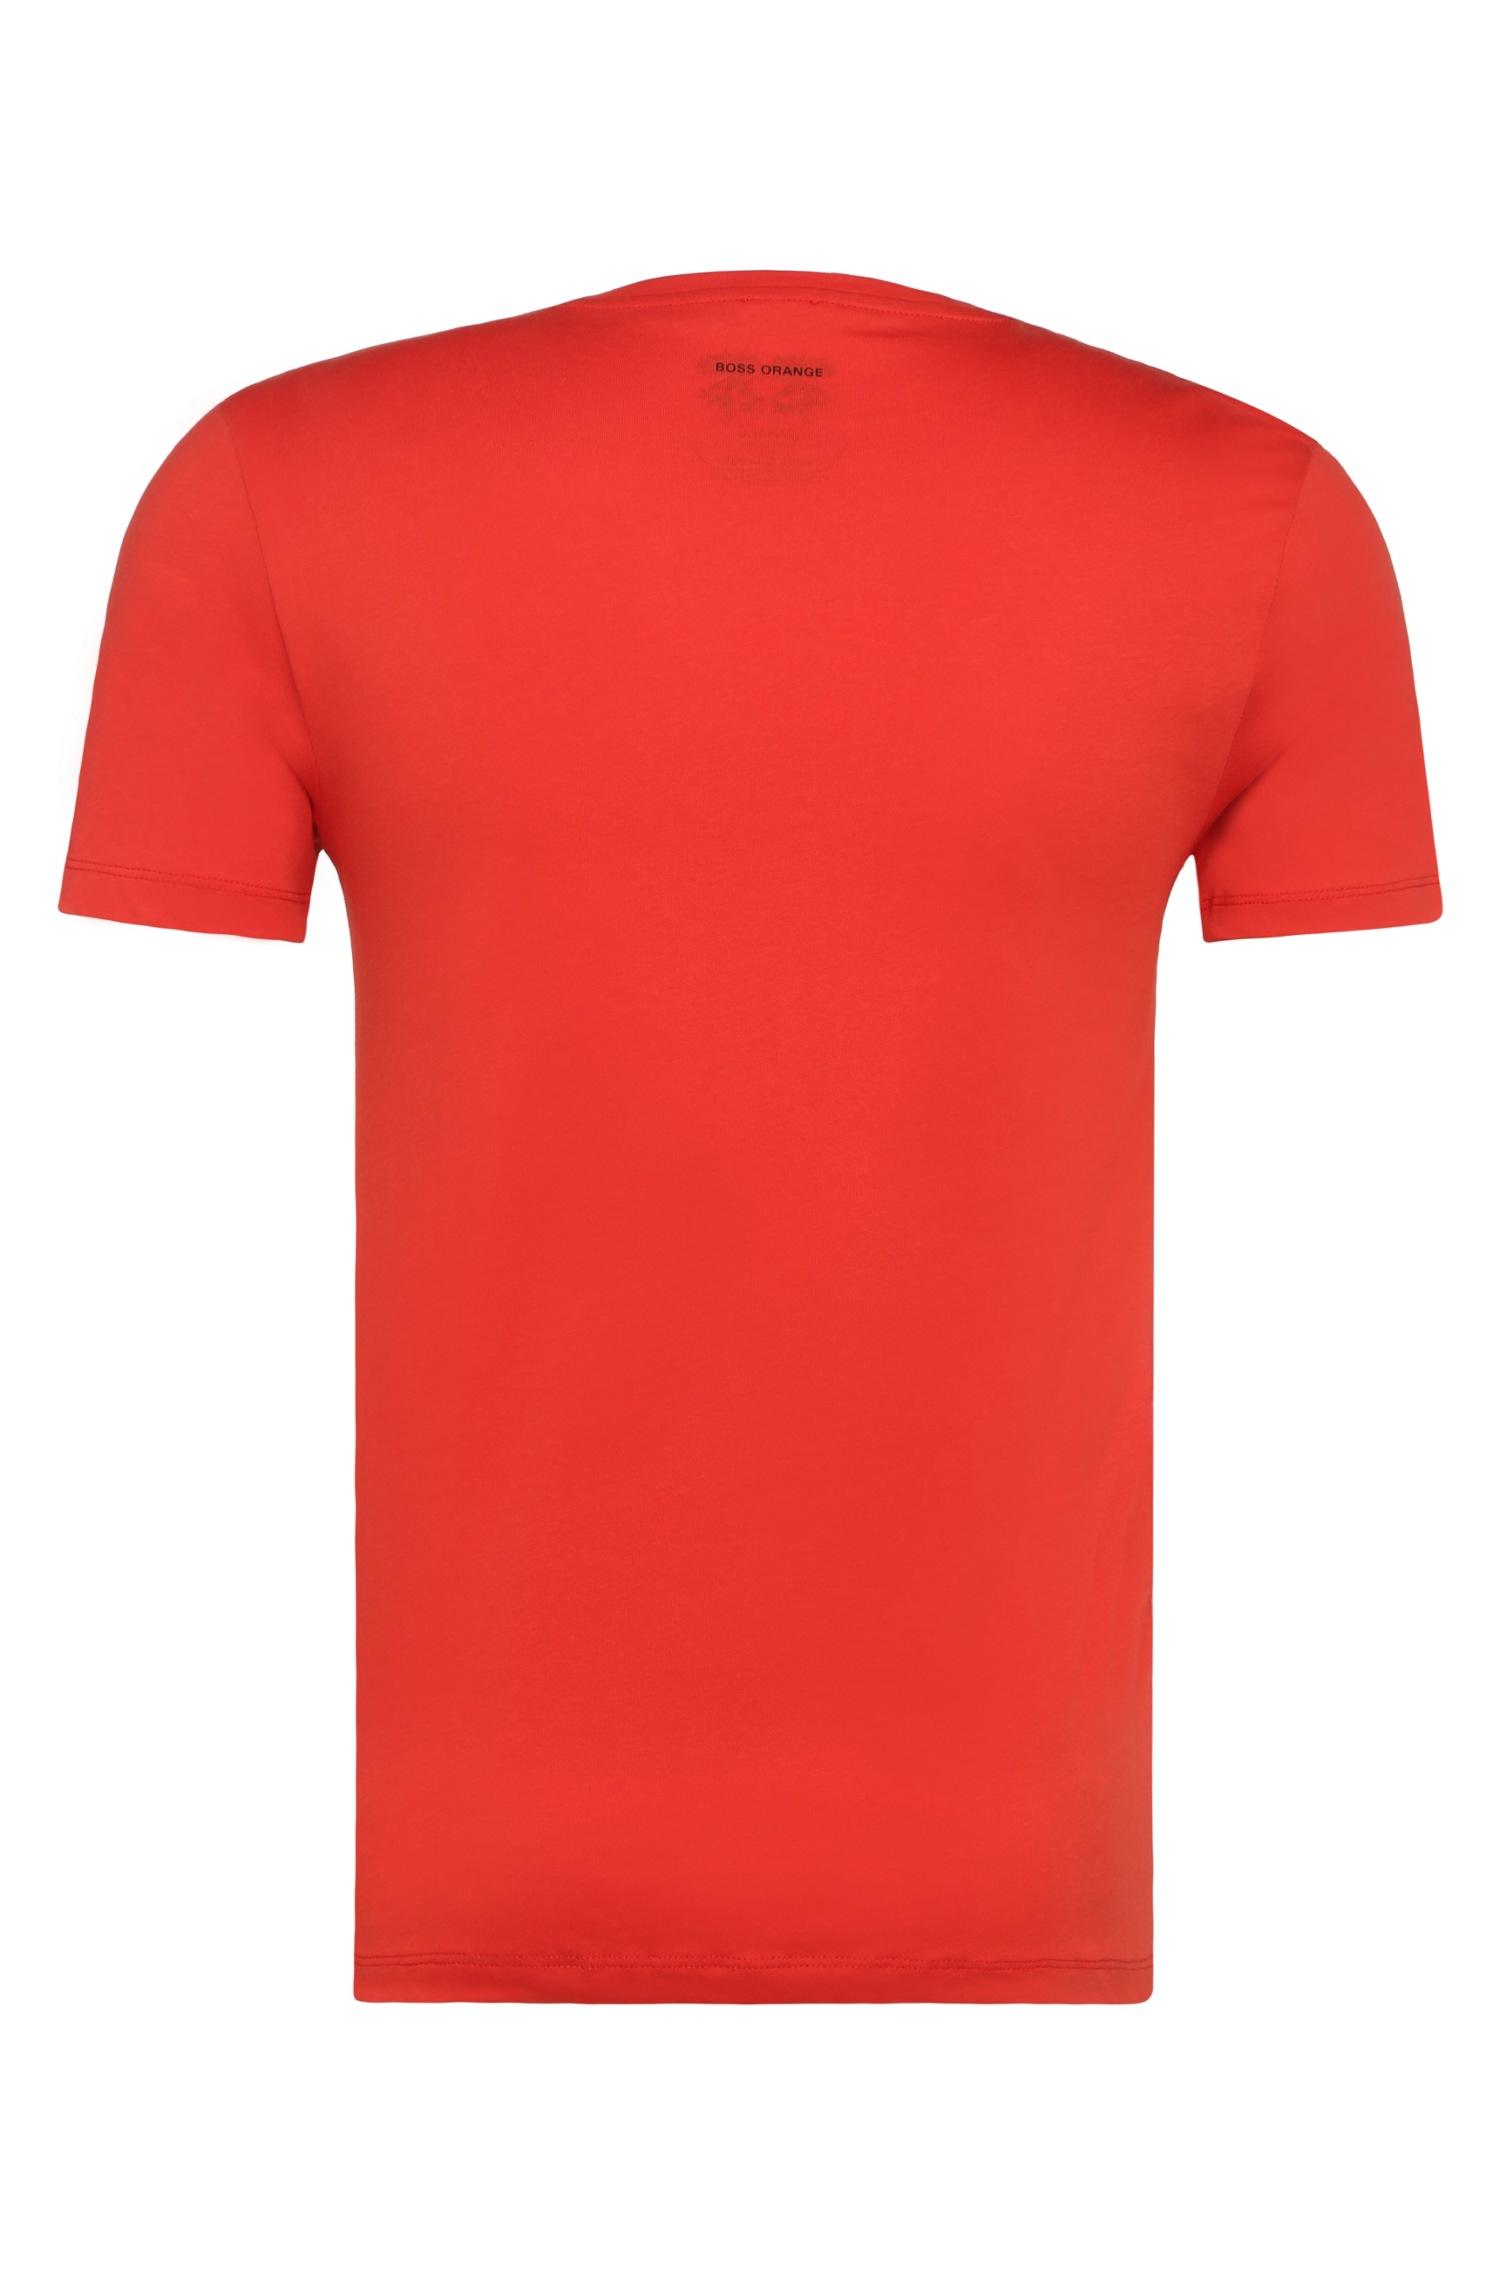 lyst boss orange t shirt in slub yarn jersey 39 tomsin 6. Black Bedroom Furniture Sets. Home Design Ideas